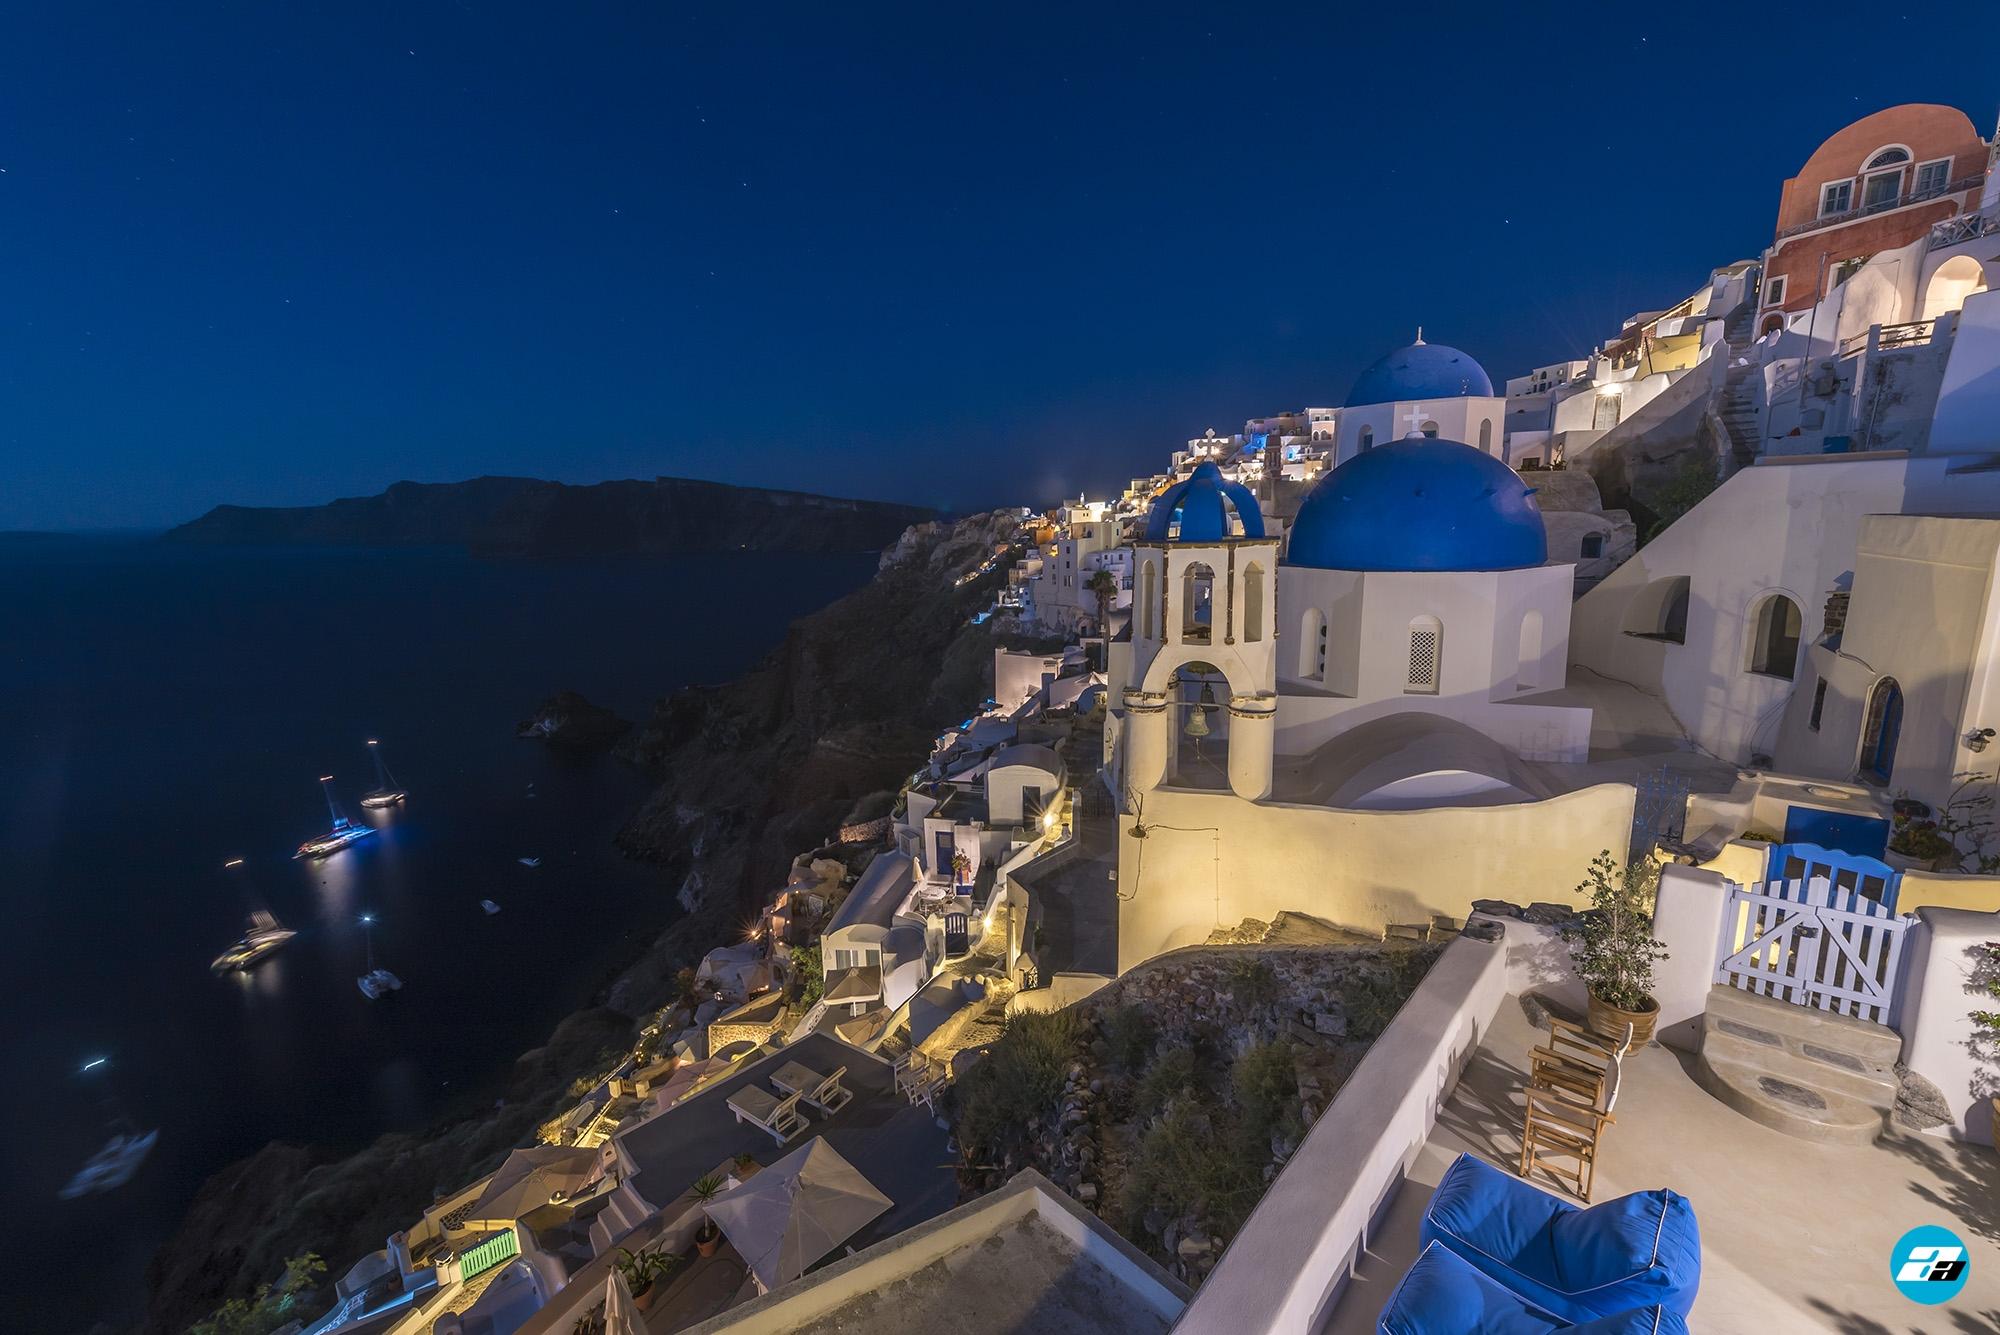 Oia, Santorini, Greece. Santorini Travel. Oia at night. Santorini at night